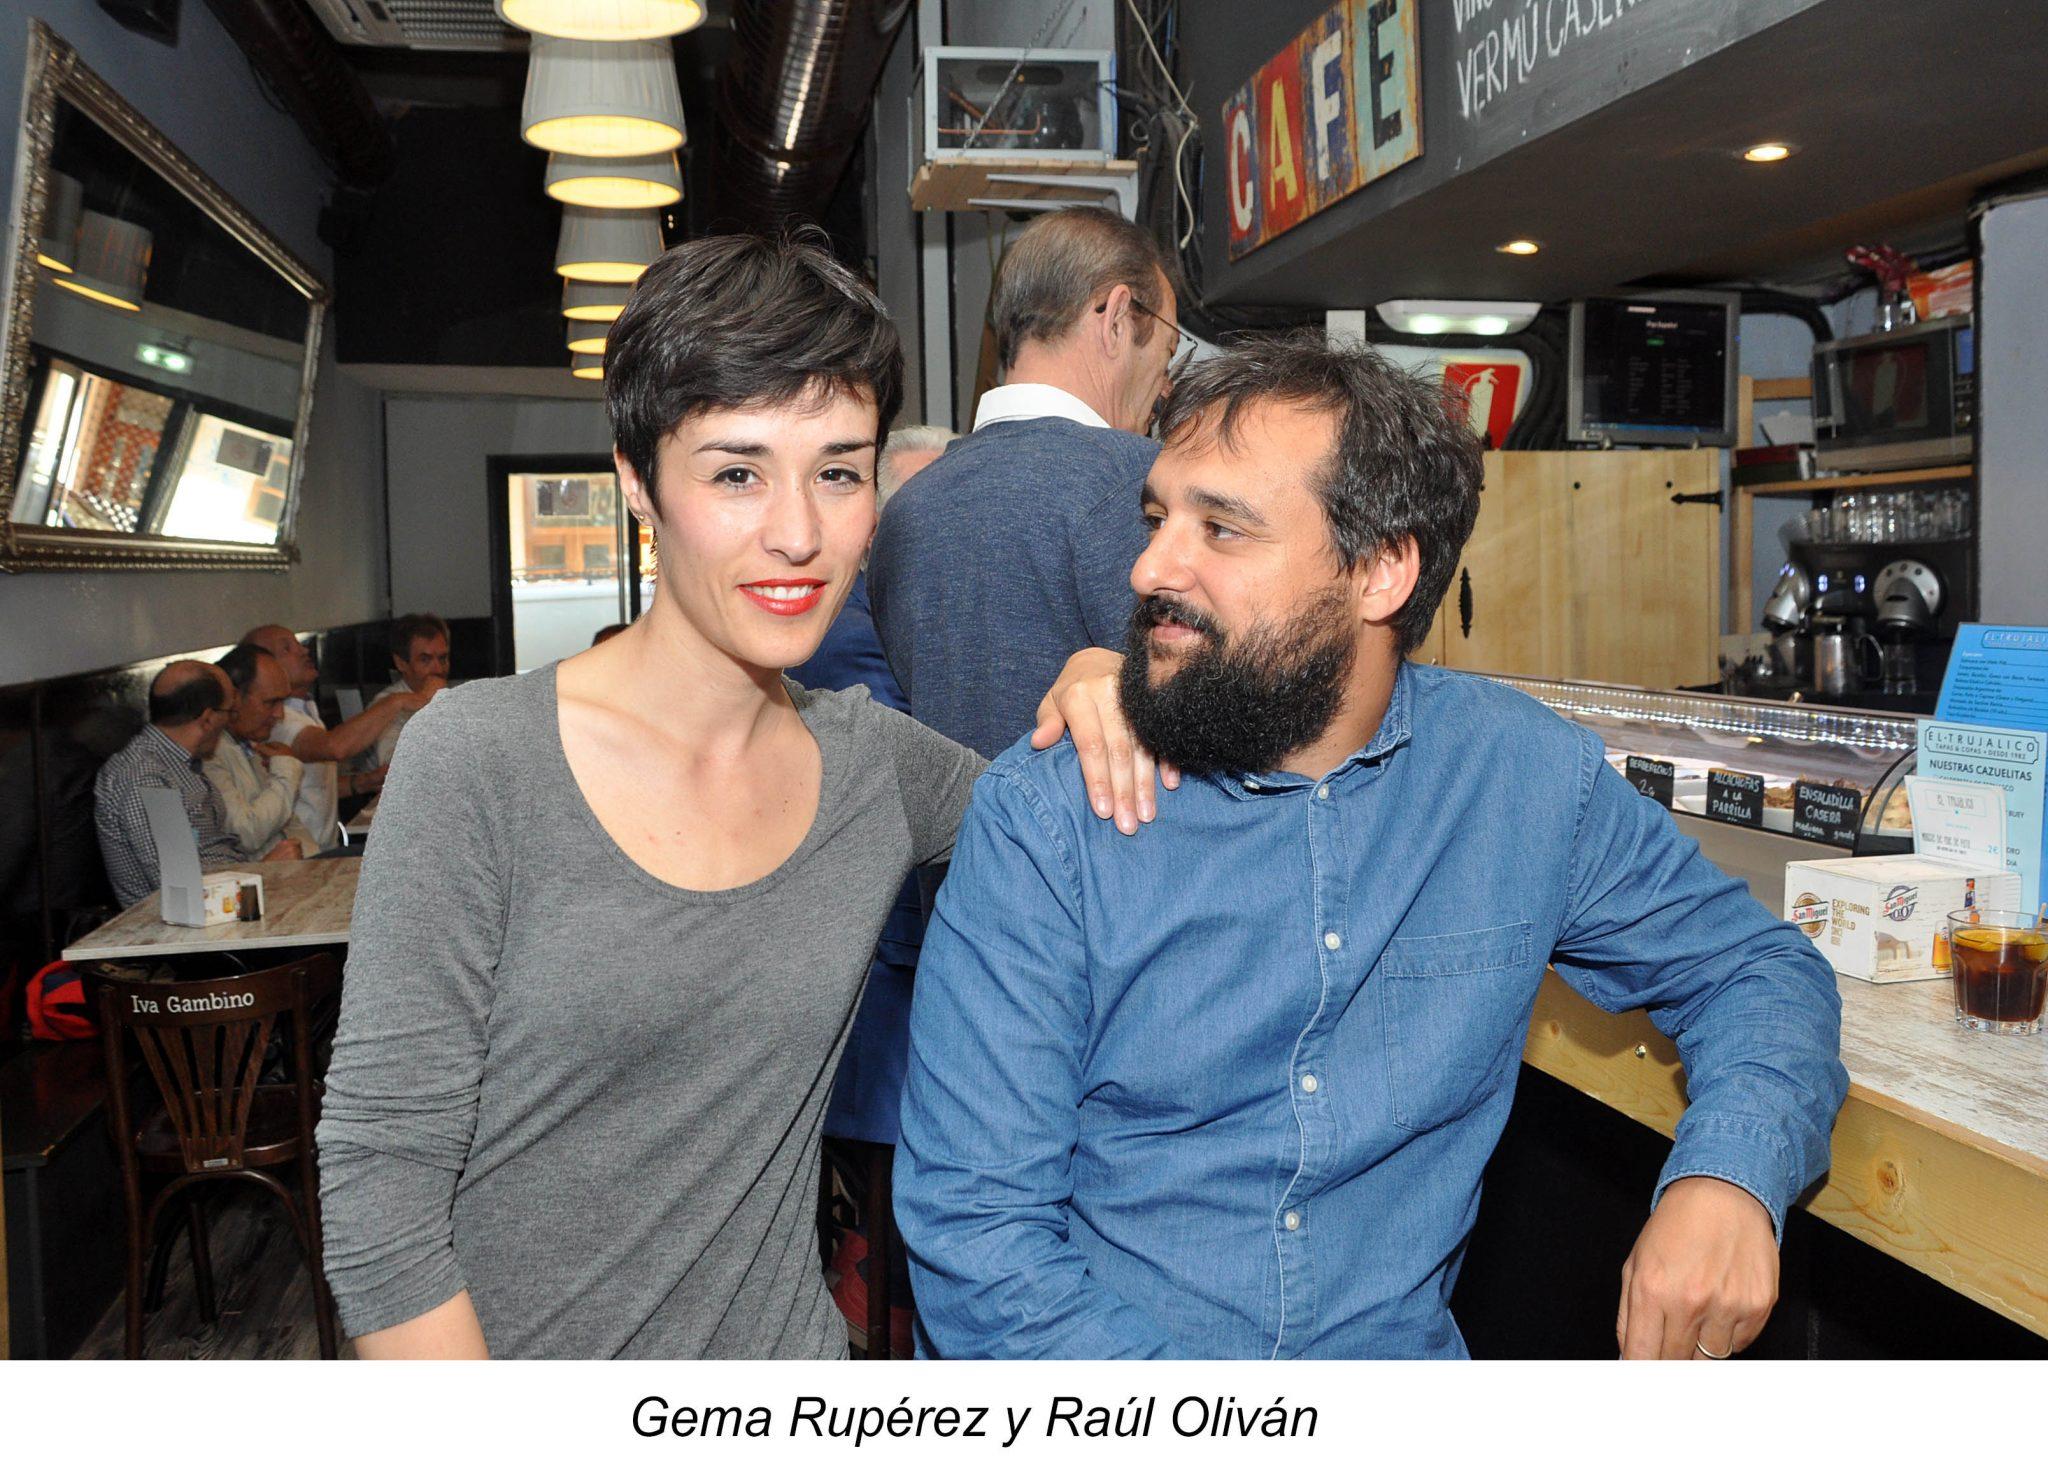 Gema_Ruperez_y_Raul_Olivan